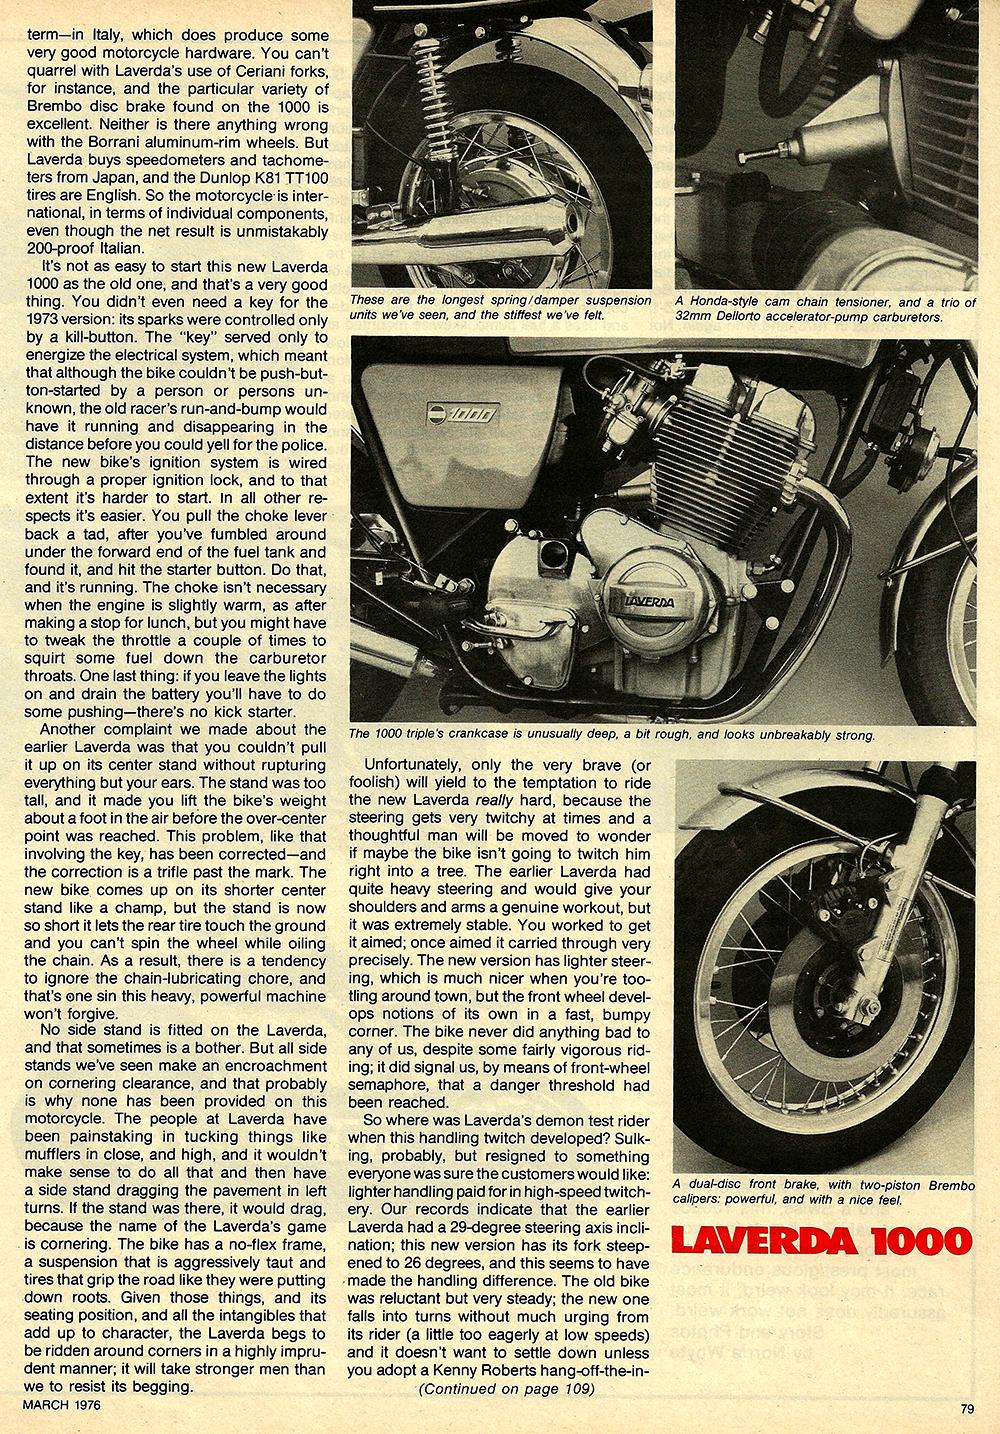 1976 Laverda 1000 road test 5.JPG